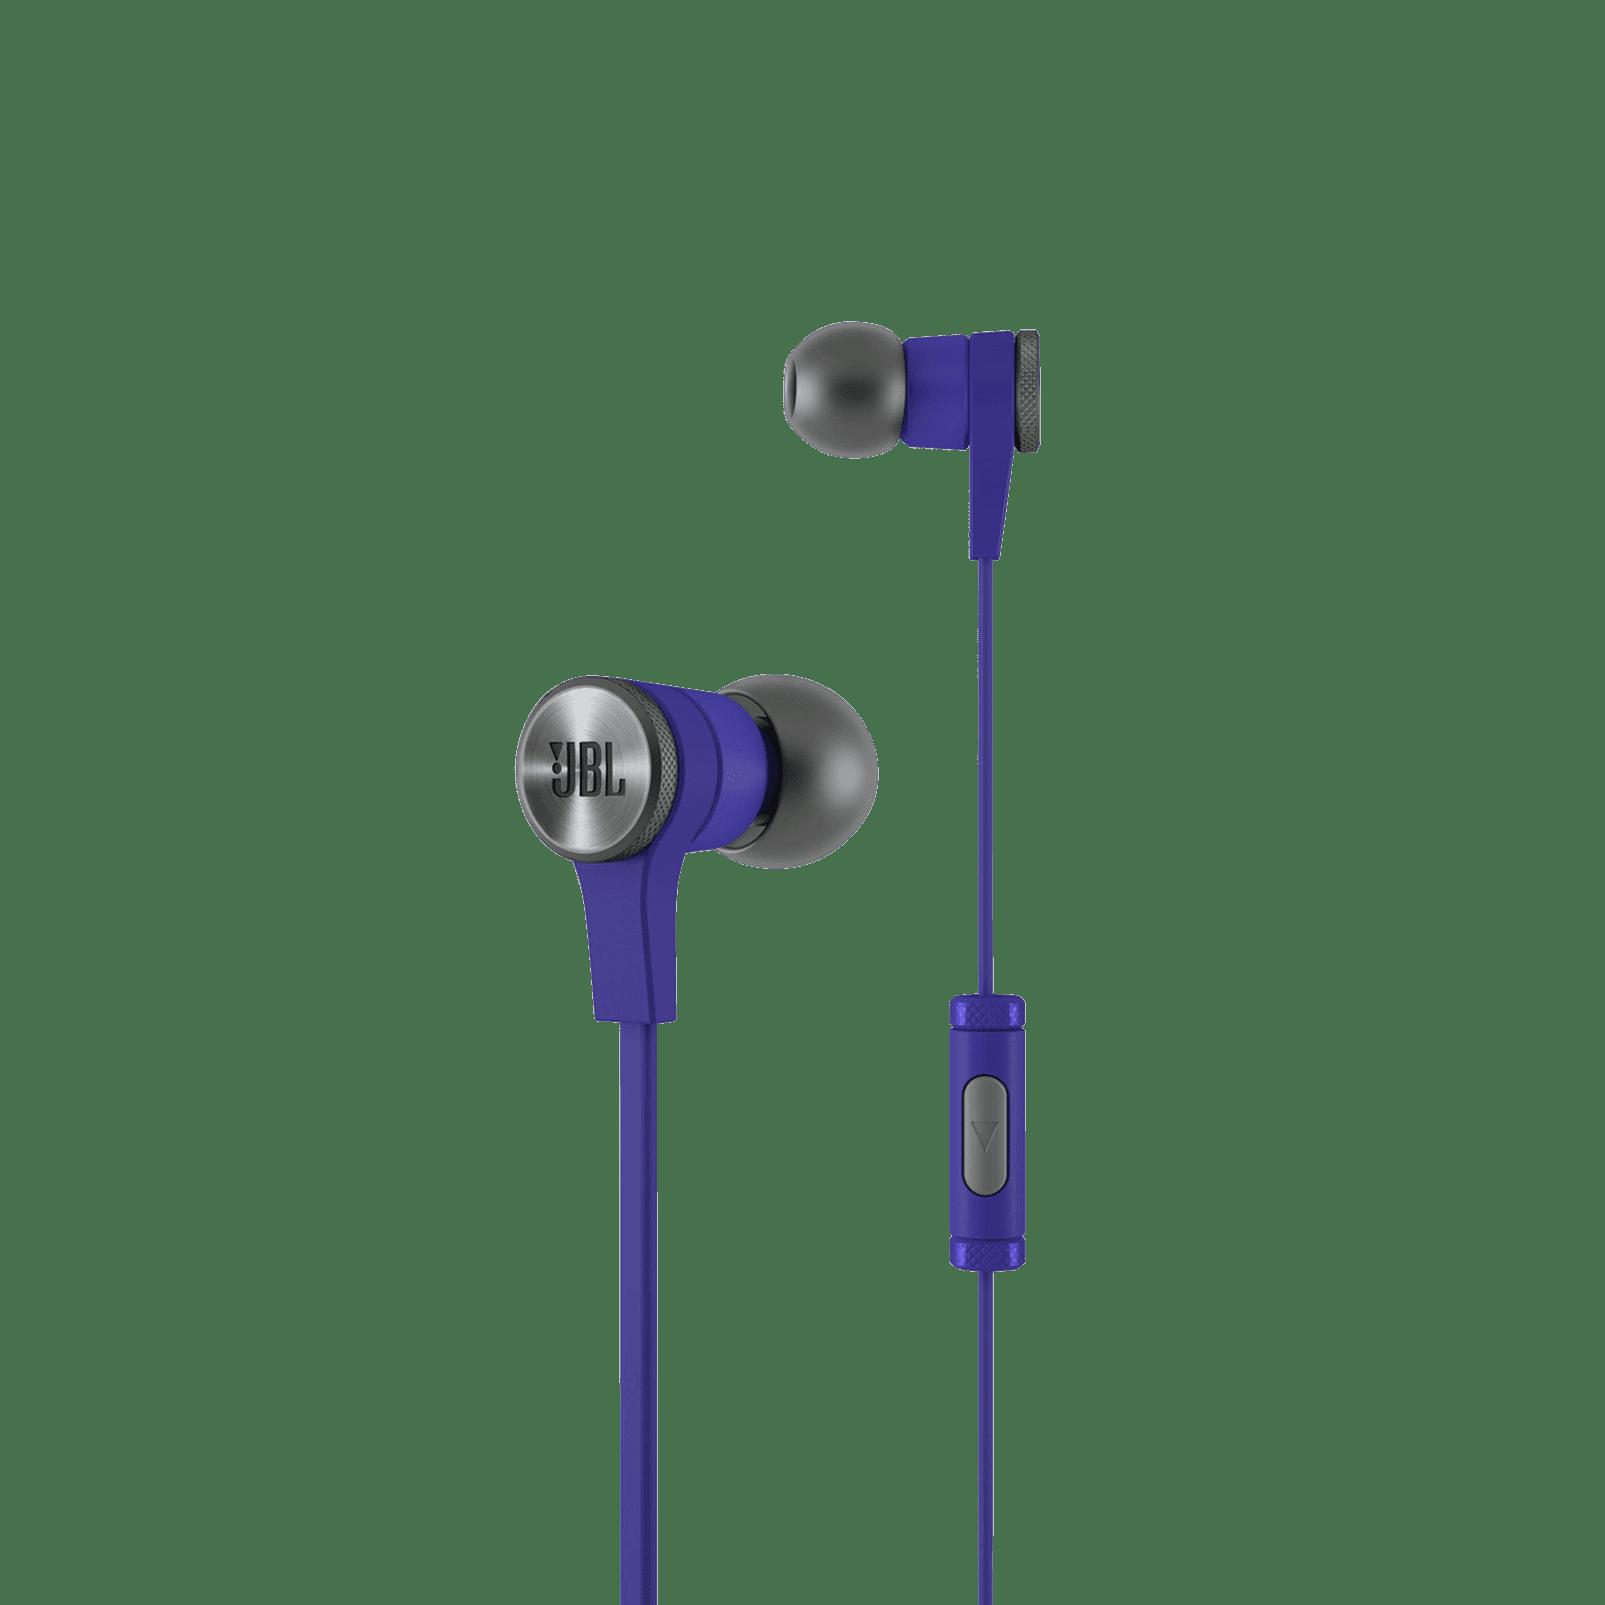 14220504291 JBL Synchros E10 - Earphones with mic - in-ear - black - Walmart.com